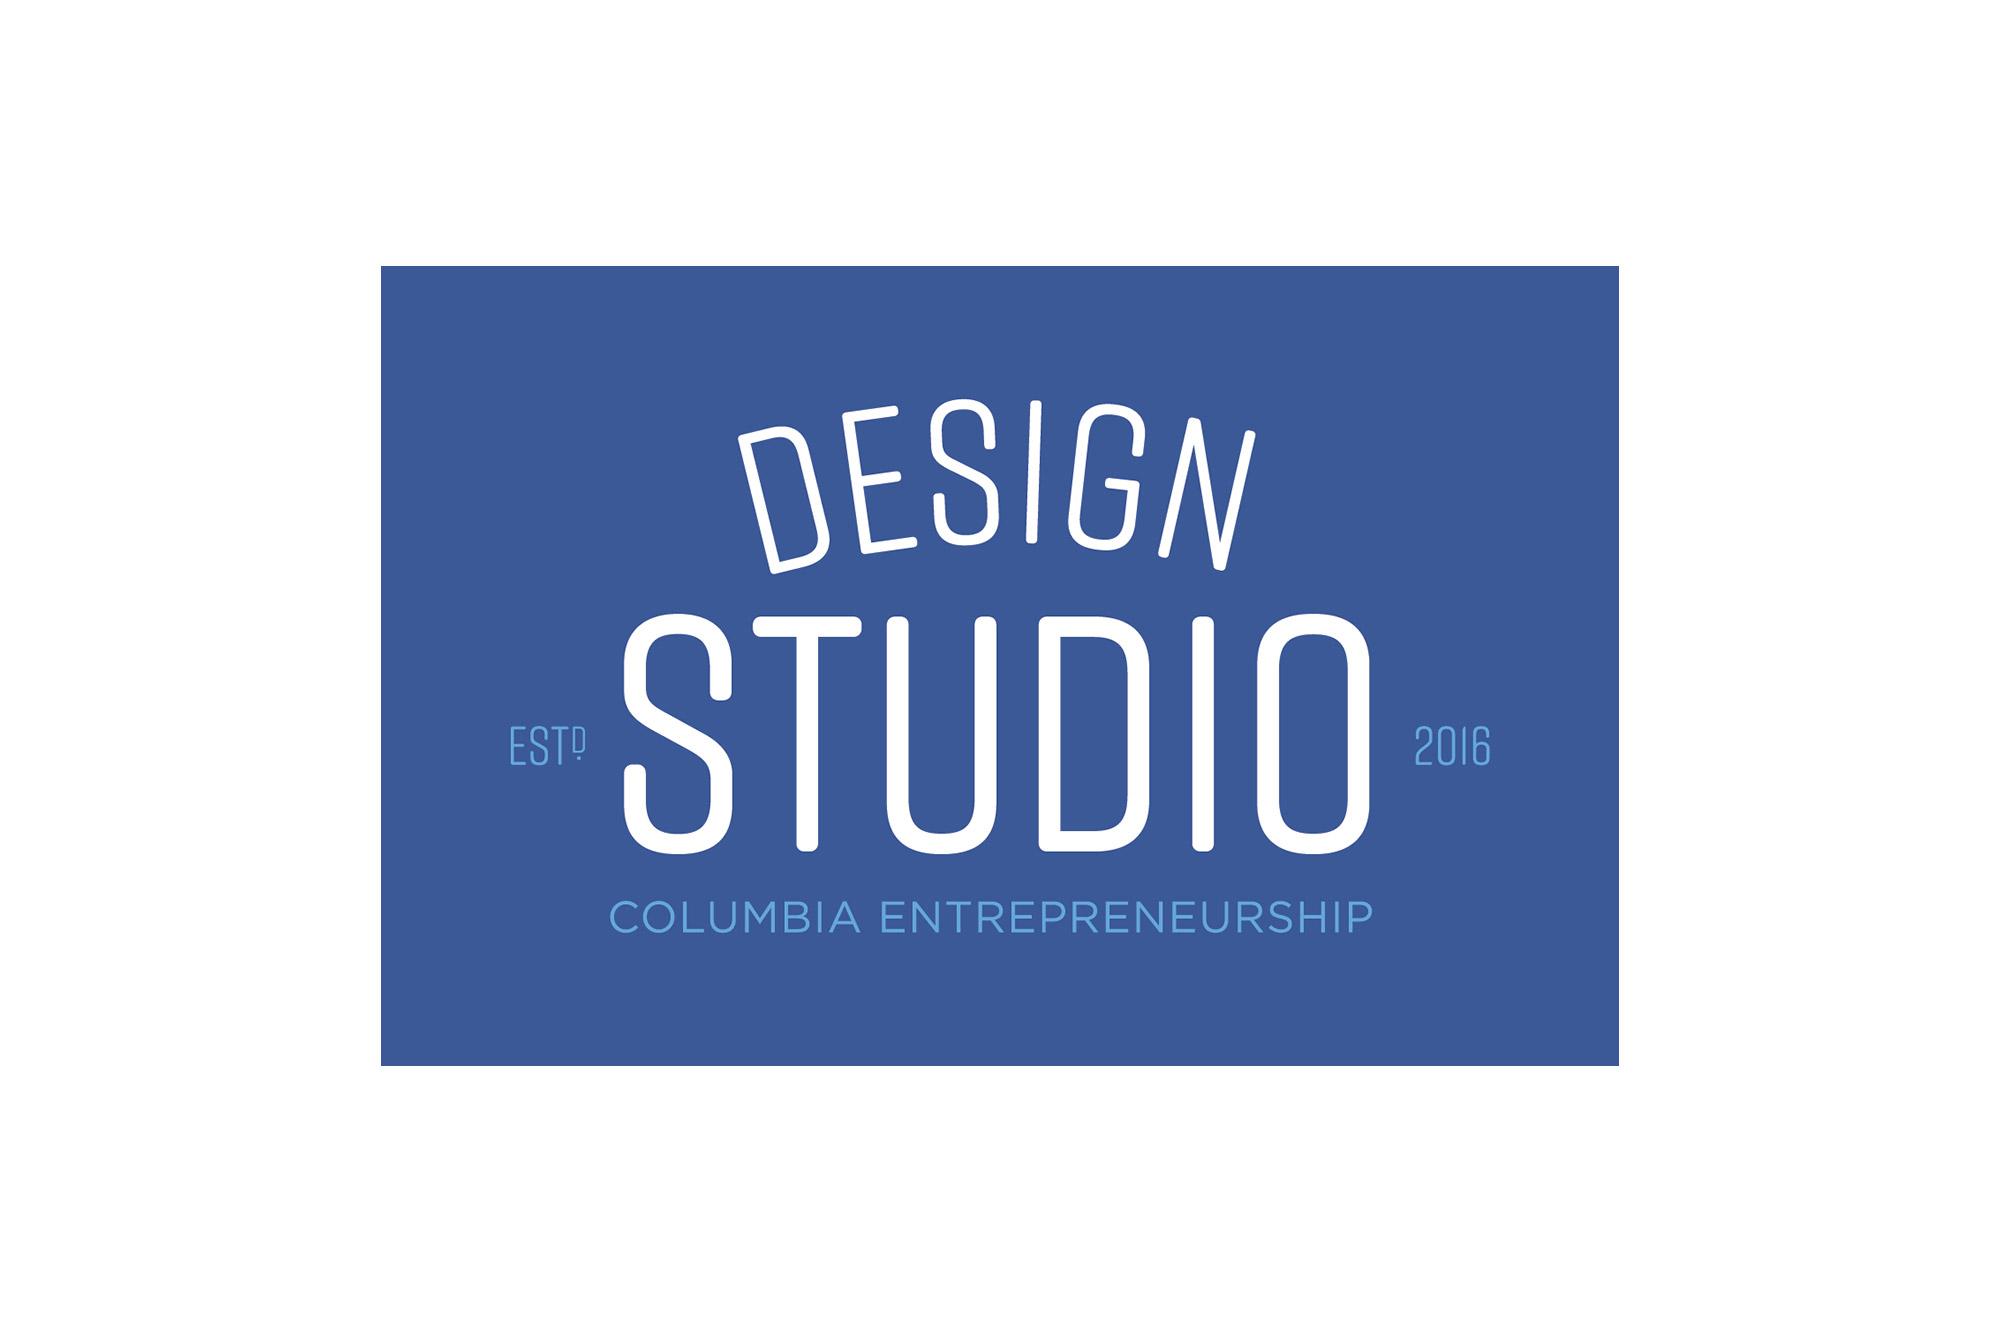 626e785bed160 Columbia Entrepreneurship Opens the Design Studio - Columbia  Entrepreneurship